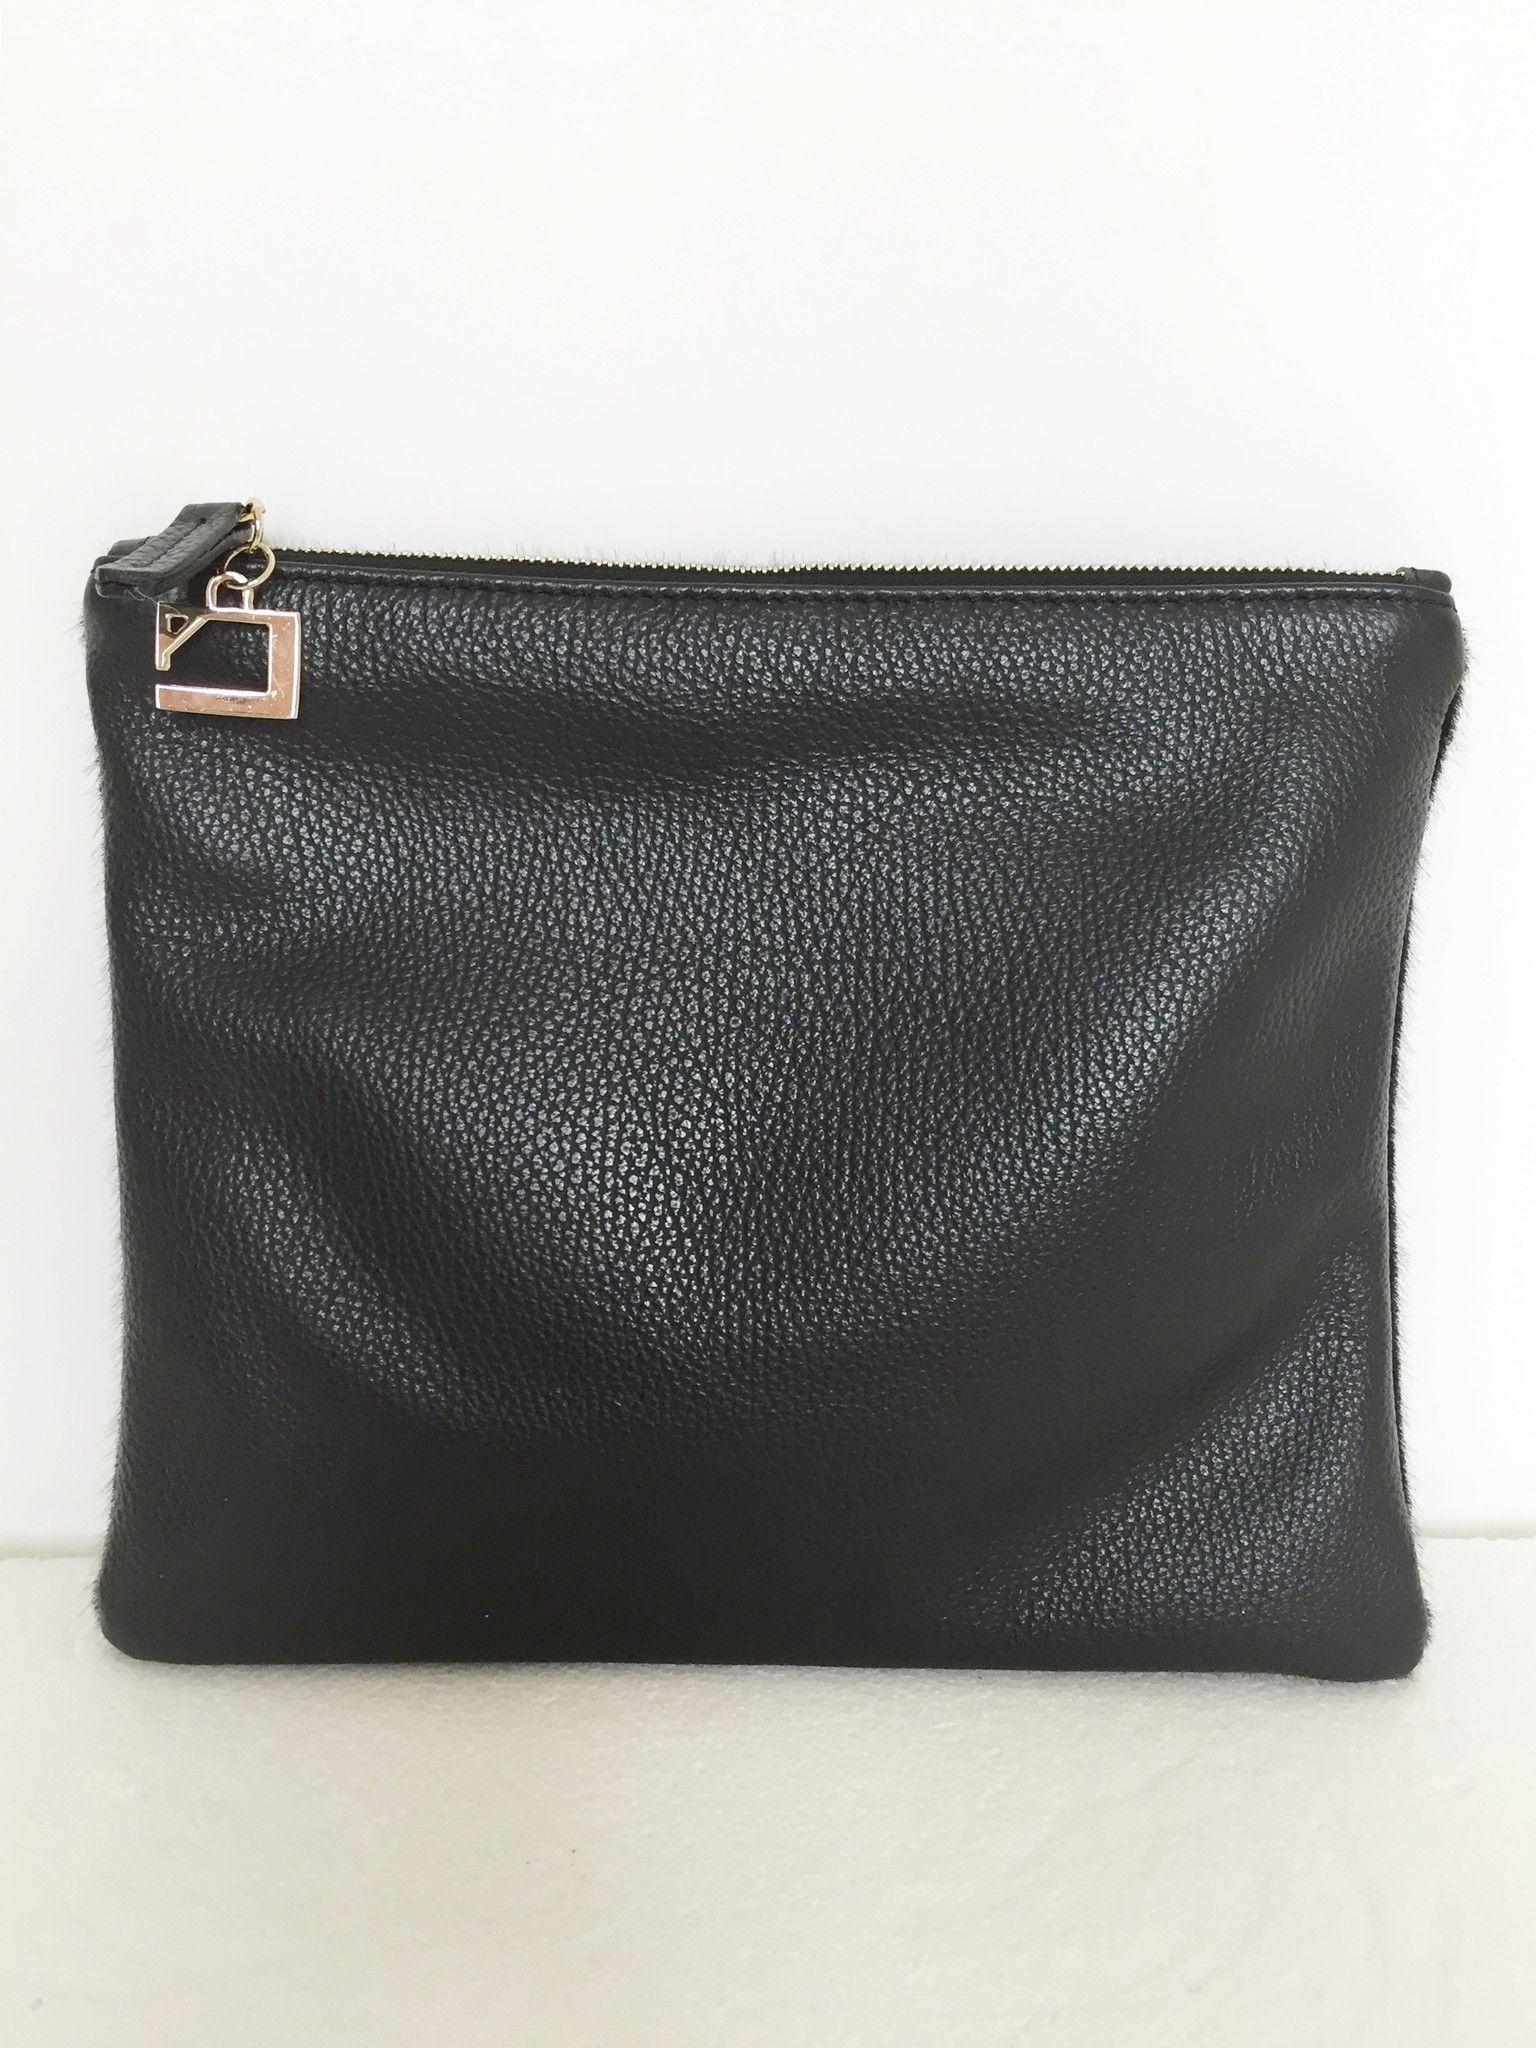 Atos Lombardini Clutch Bag Cod.214P